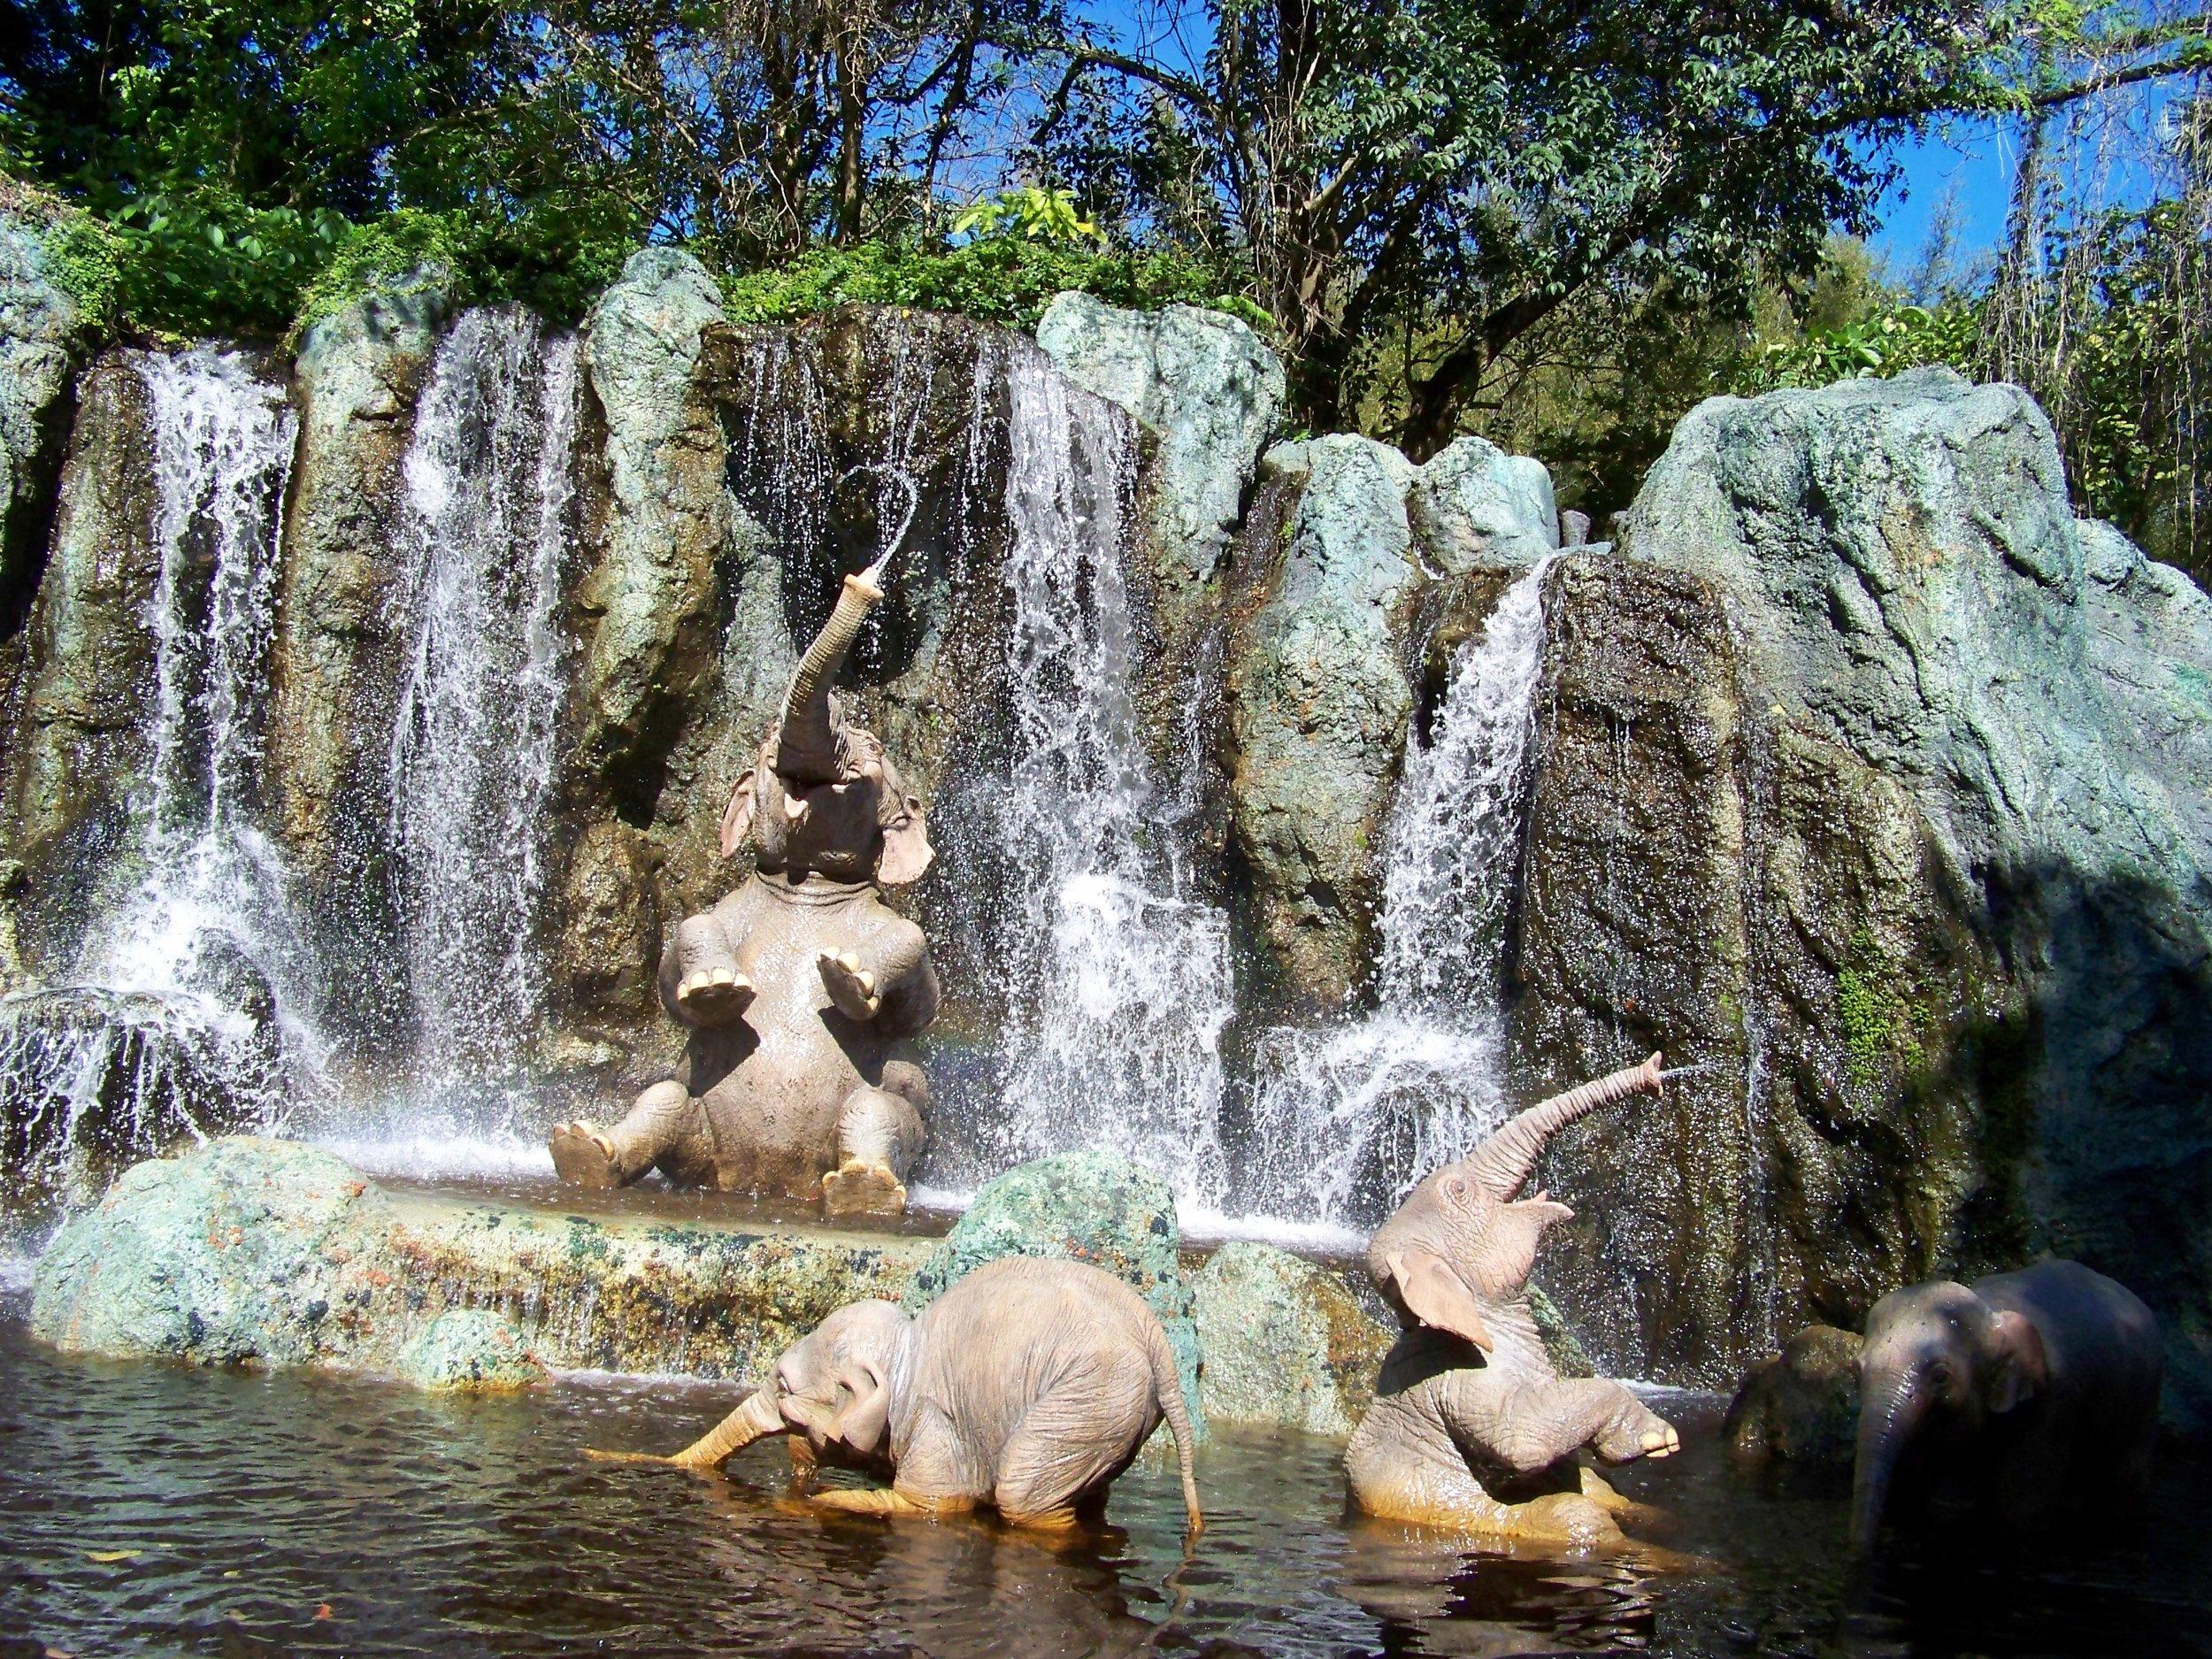 Jungle Cruise, Adventureland, Magic Kingdom